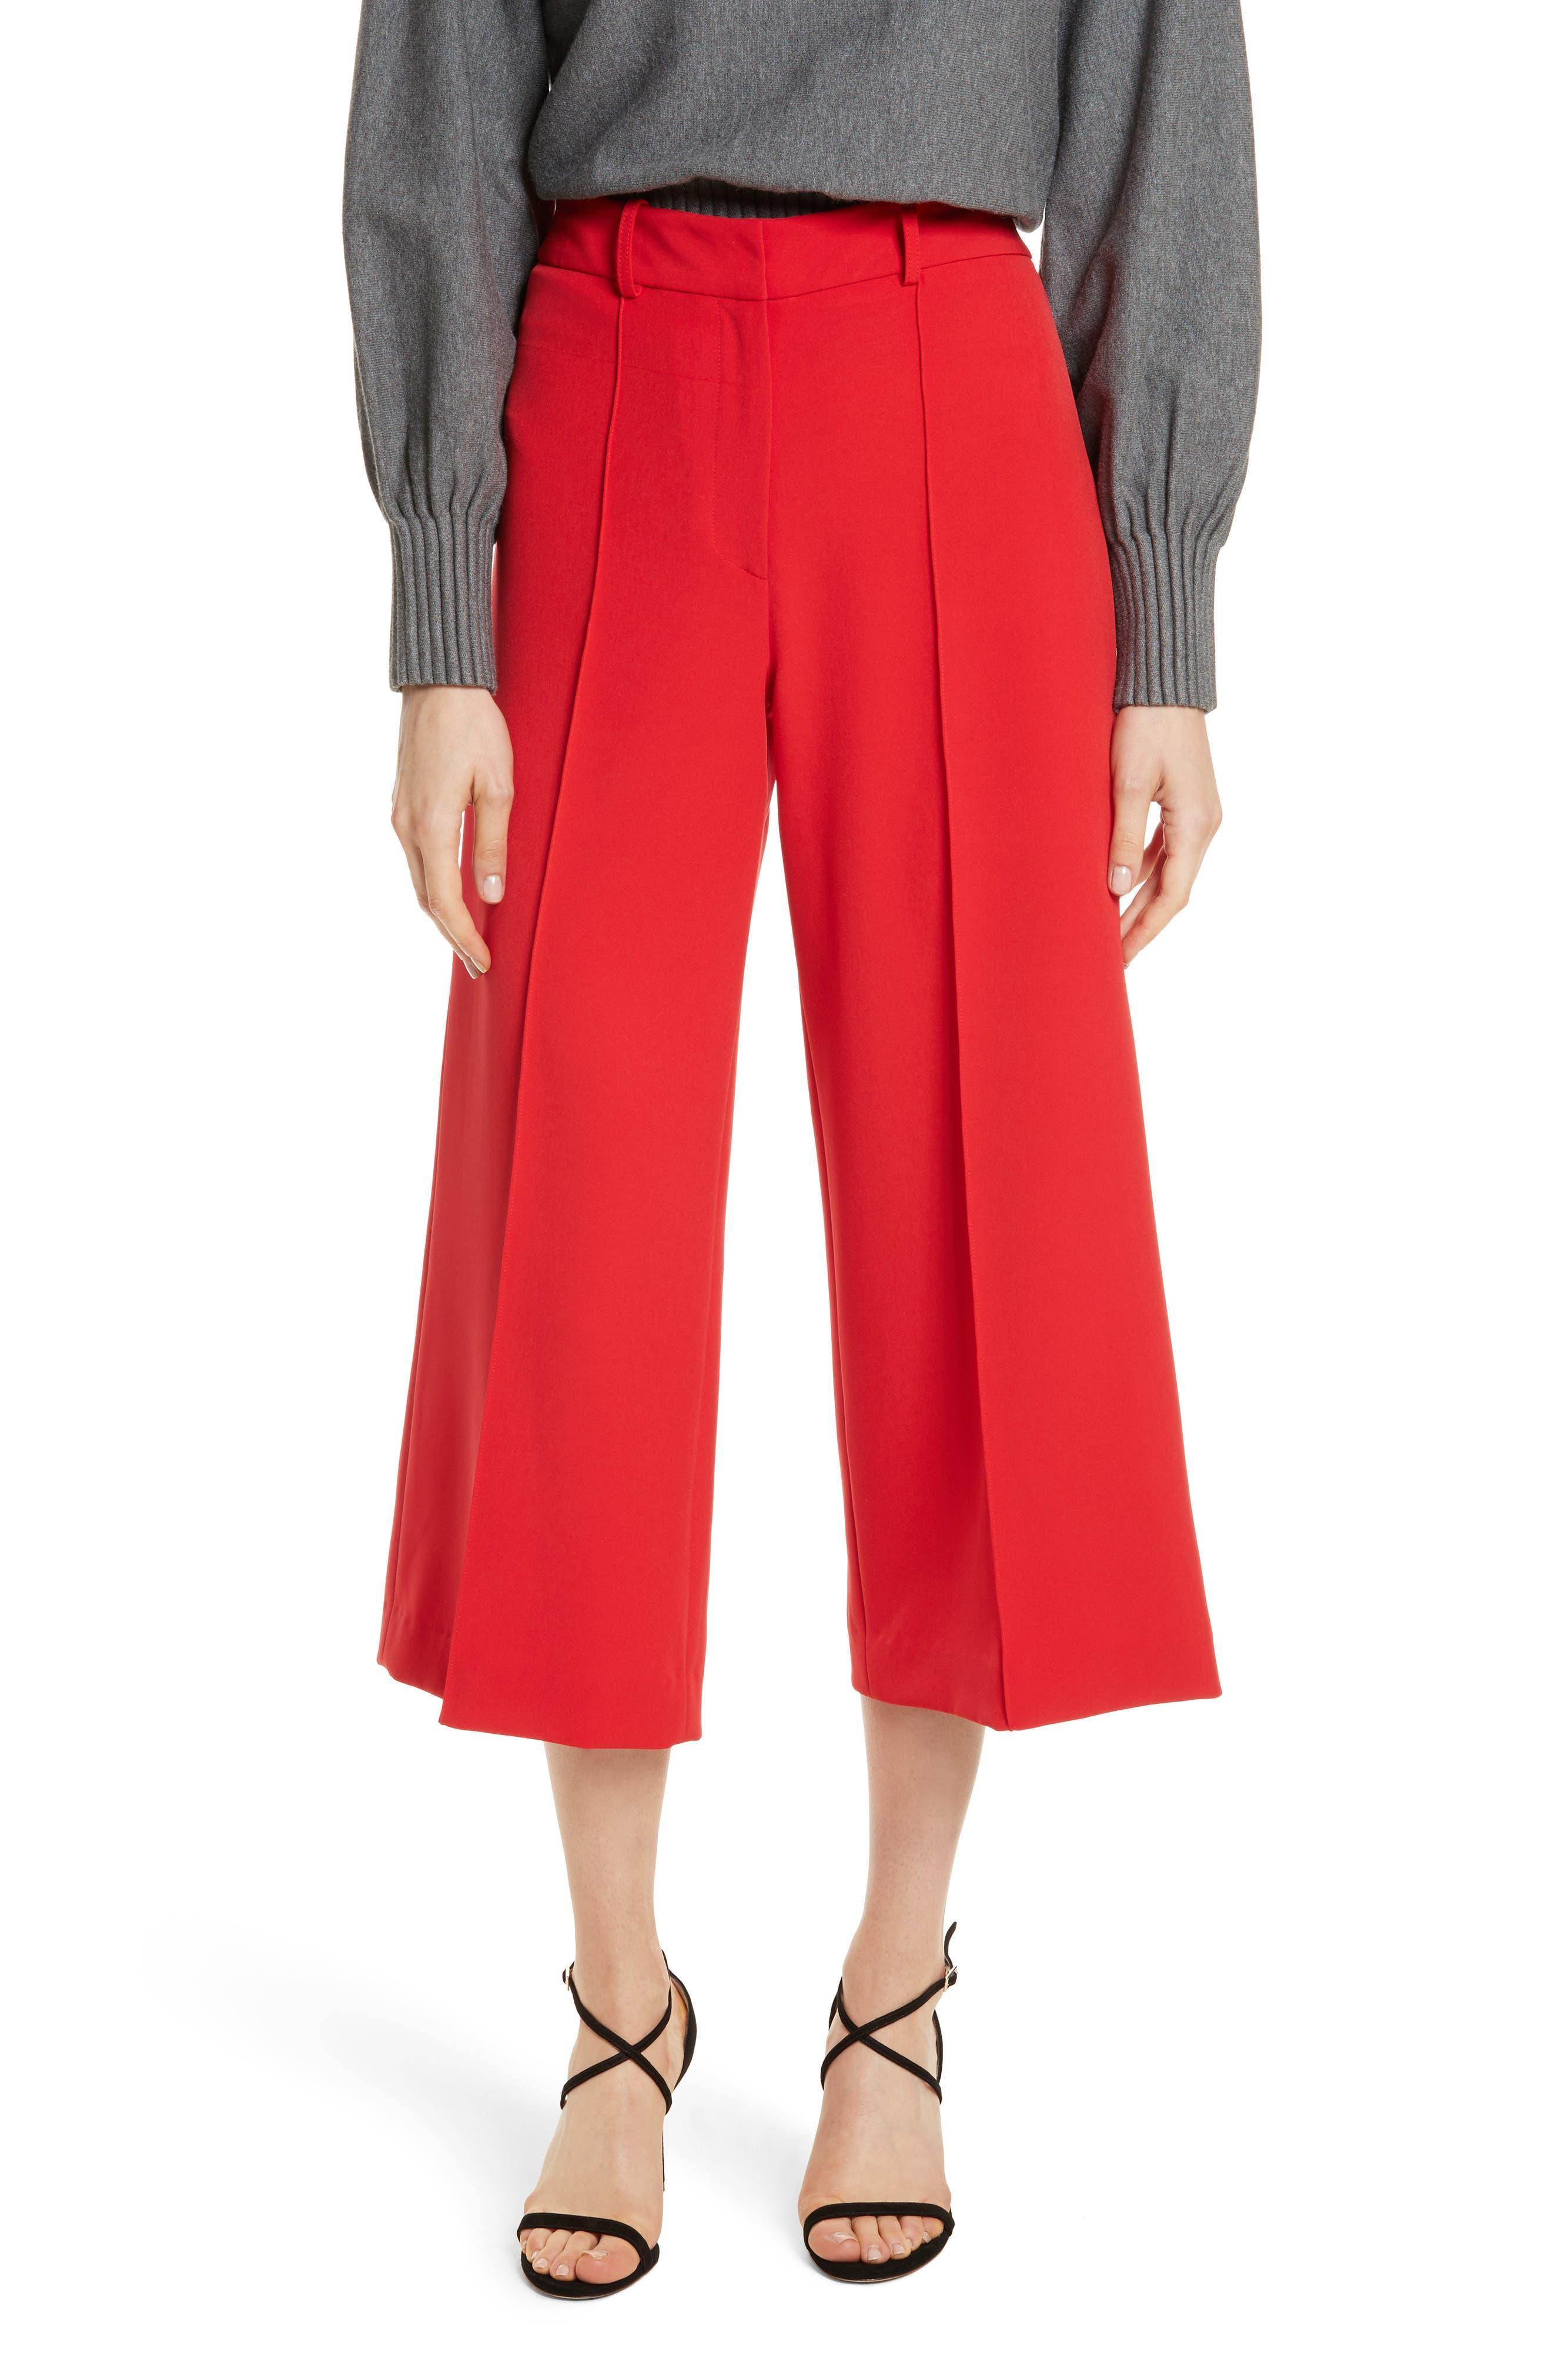 Hayden Italian Cady Crop Pants,                             Main thumbnail 1, color,                             649